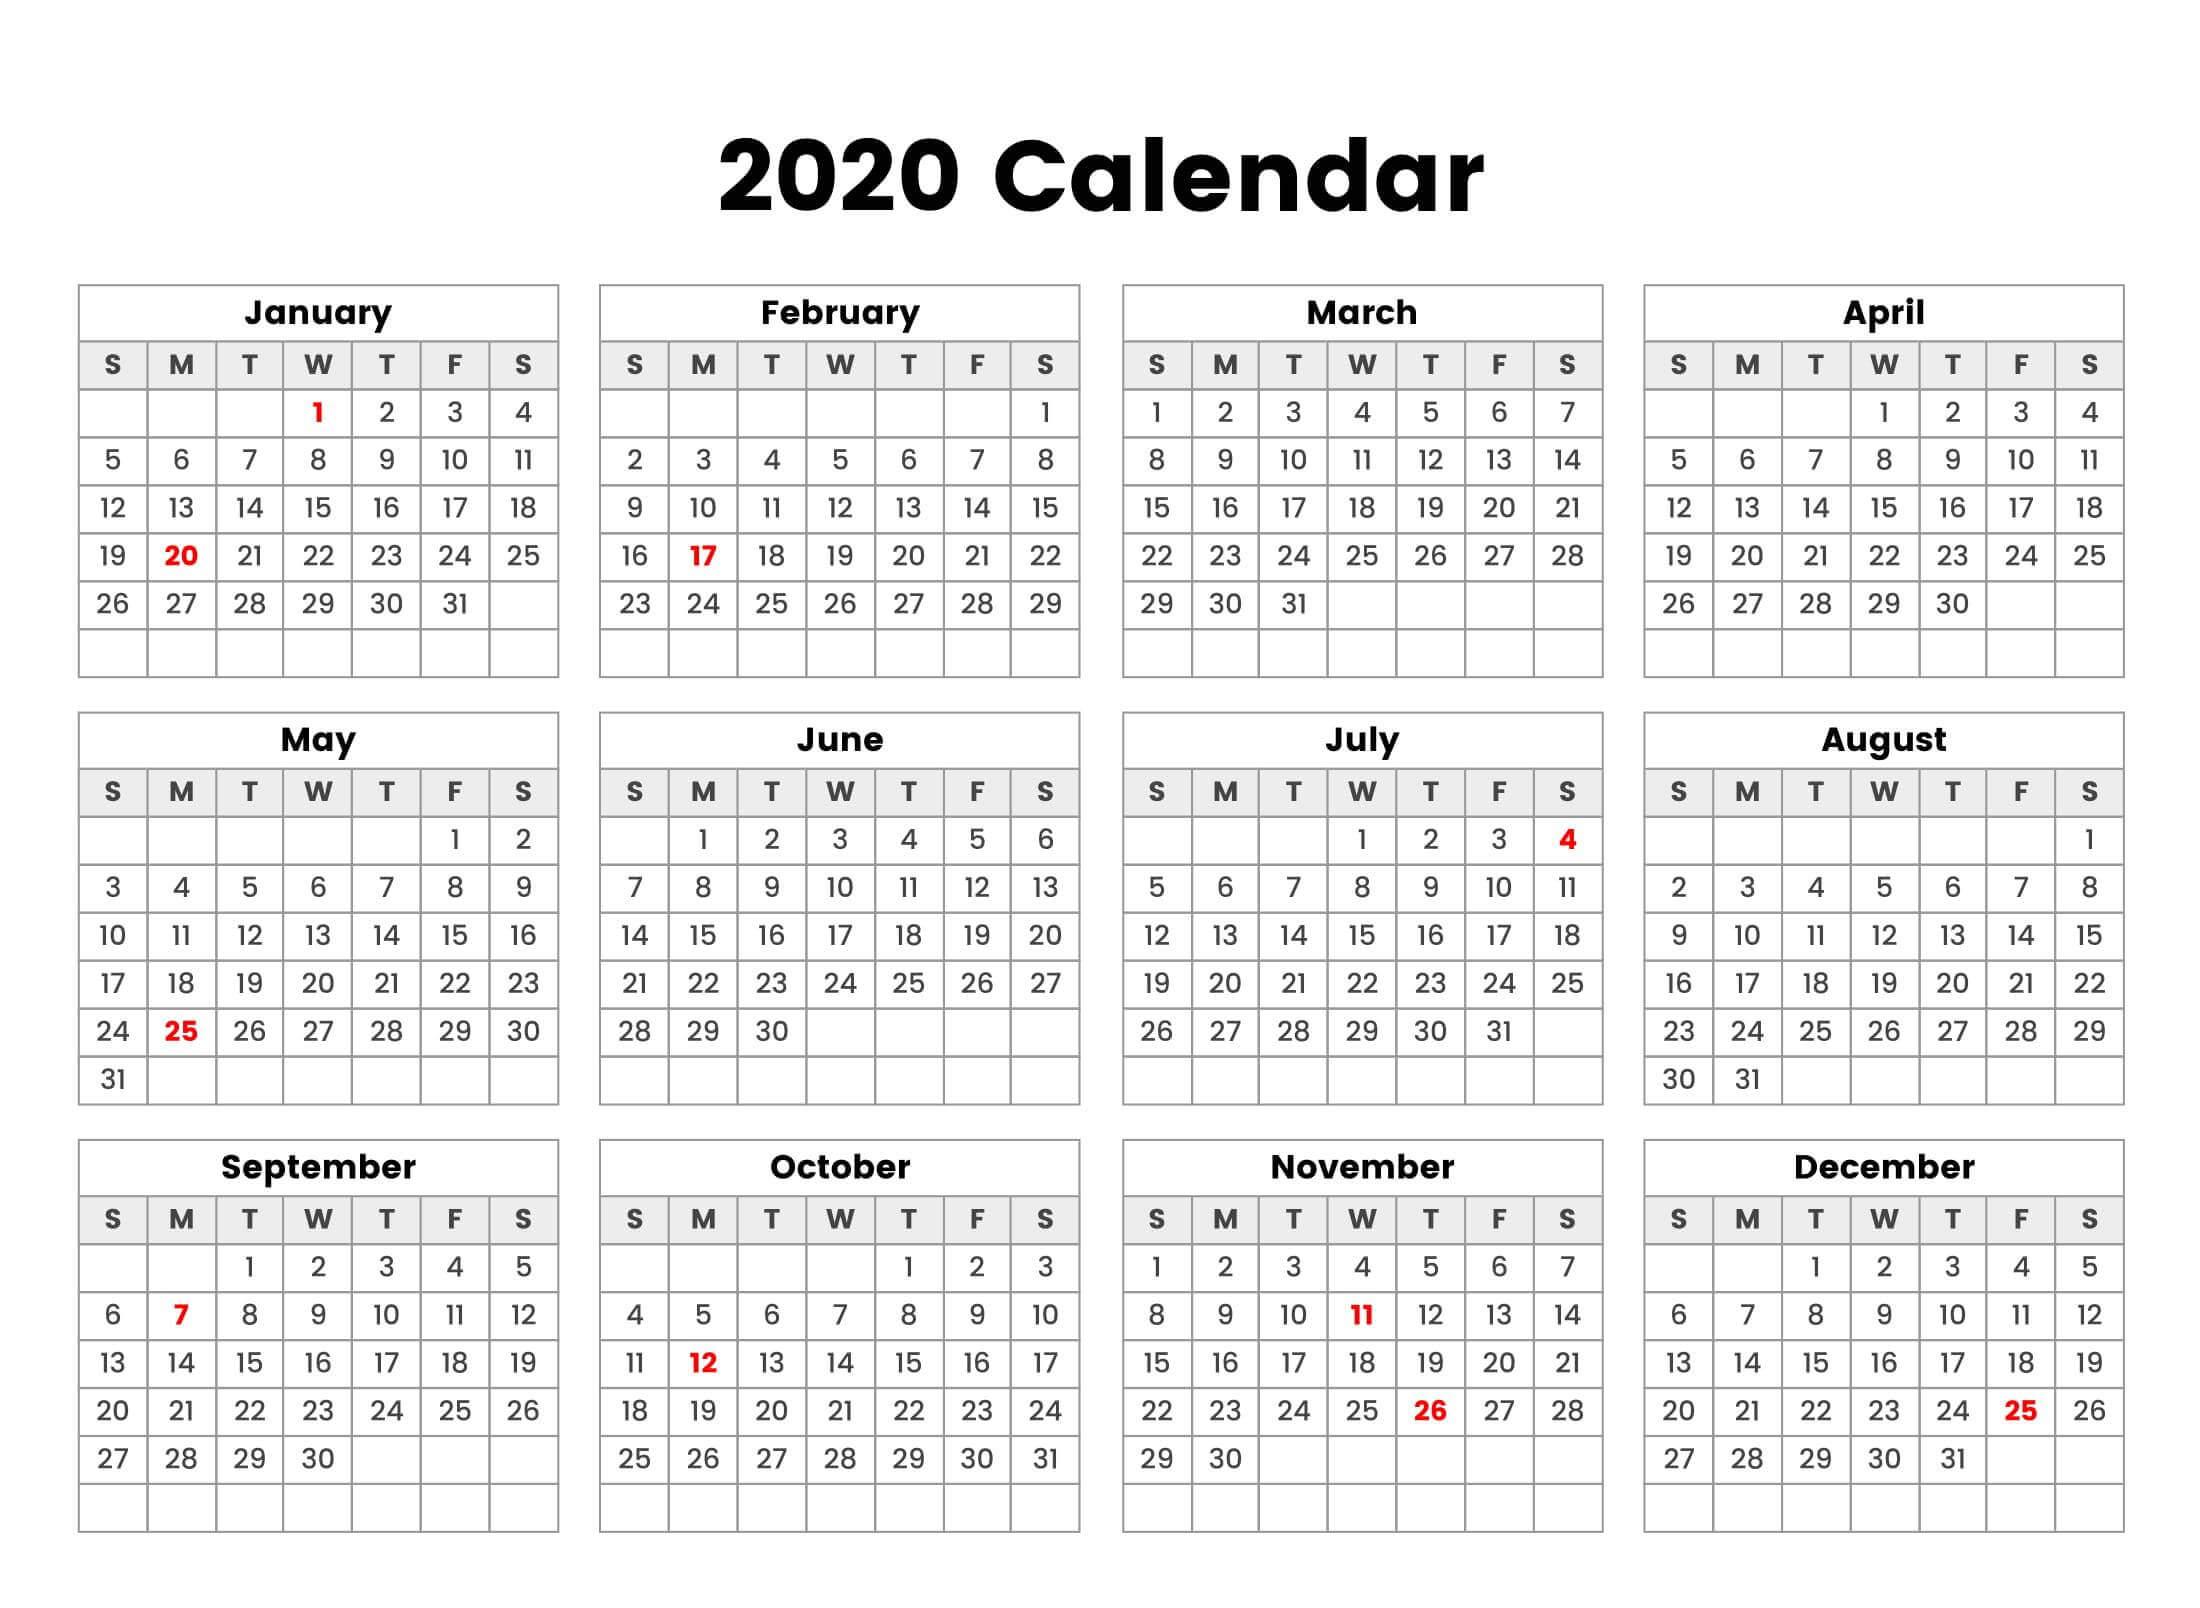 Take 2020 All Year Calendar | Calendar Printables Free Blank throughout All Year Calendar